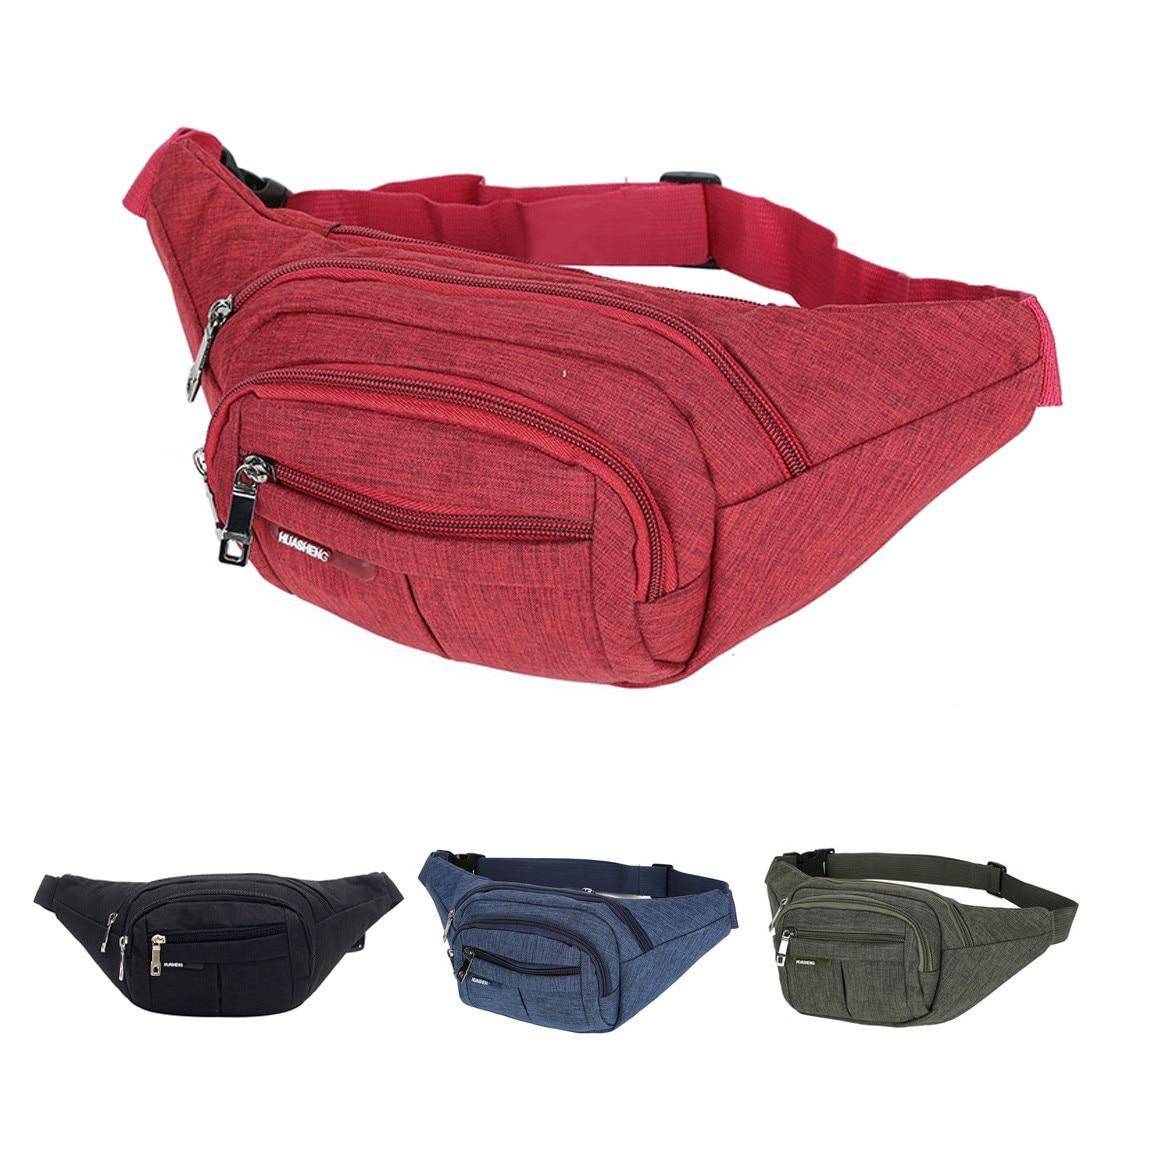 5 Colors New Unisex Waist Pack Men Women Fanny Pack Bum Bag Travelling Phone Money Pouch Banana Bags Female Belt Bags